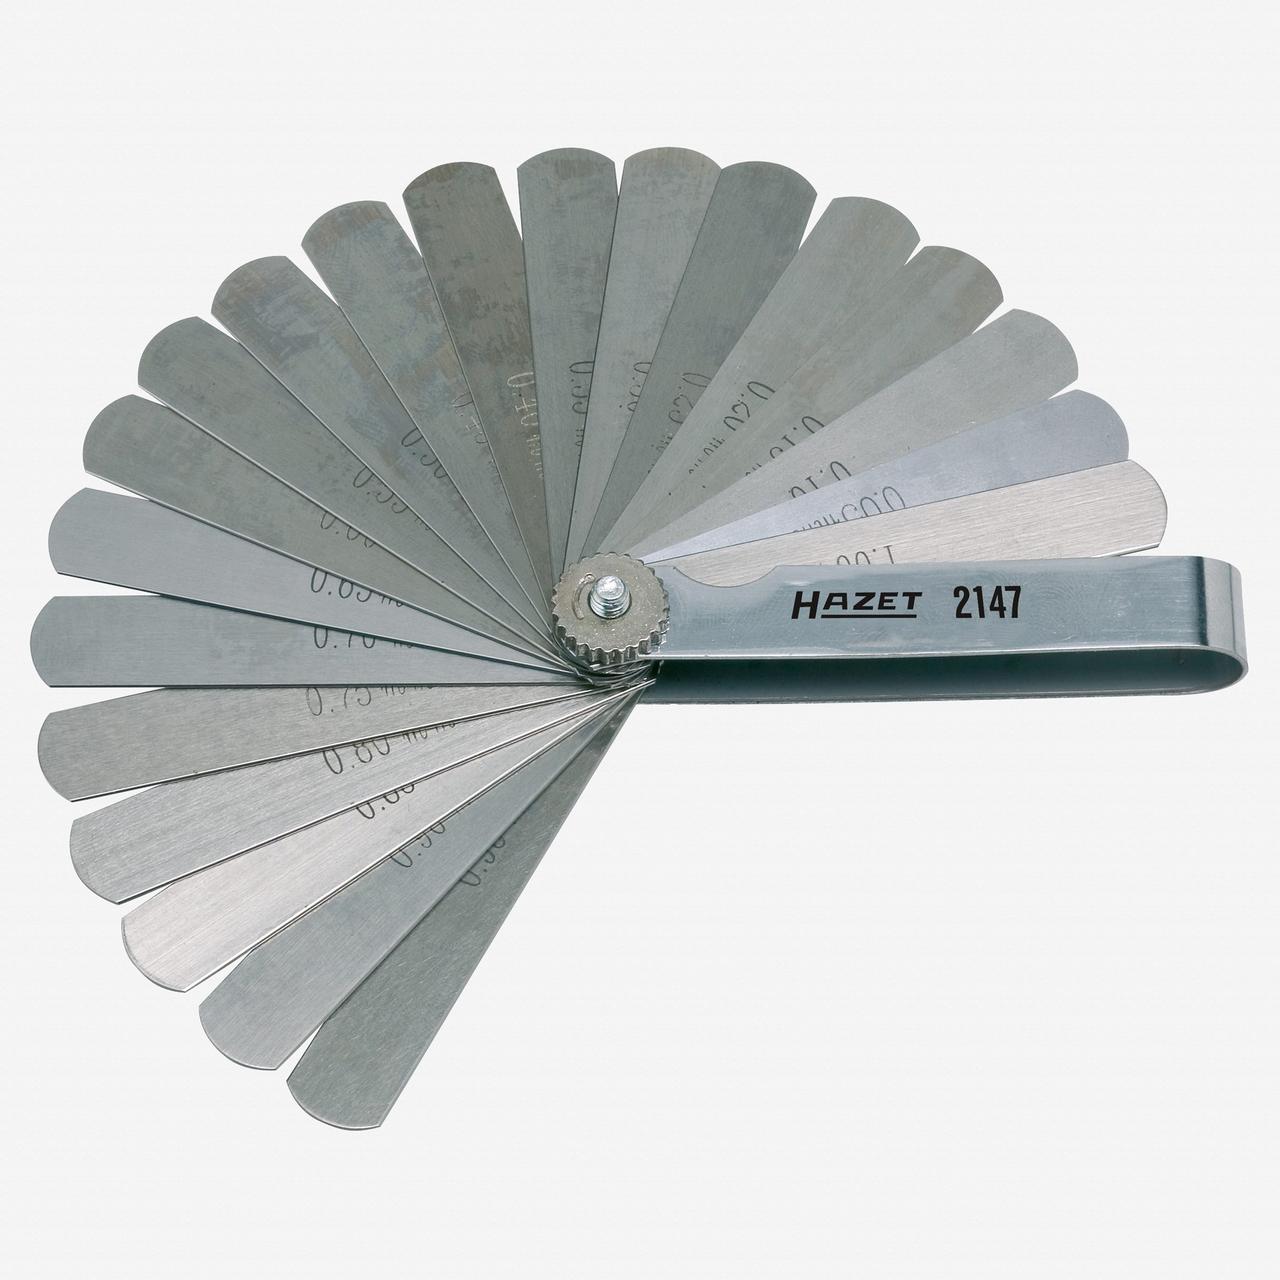 Hazet 2147 Feeler gauge  - KC Tool